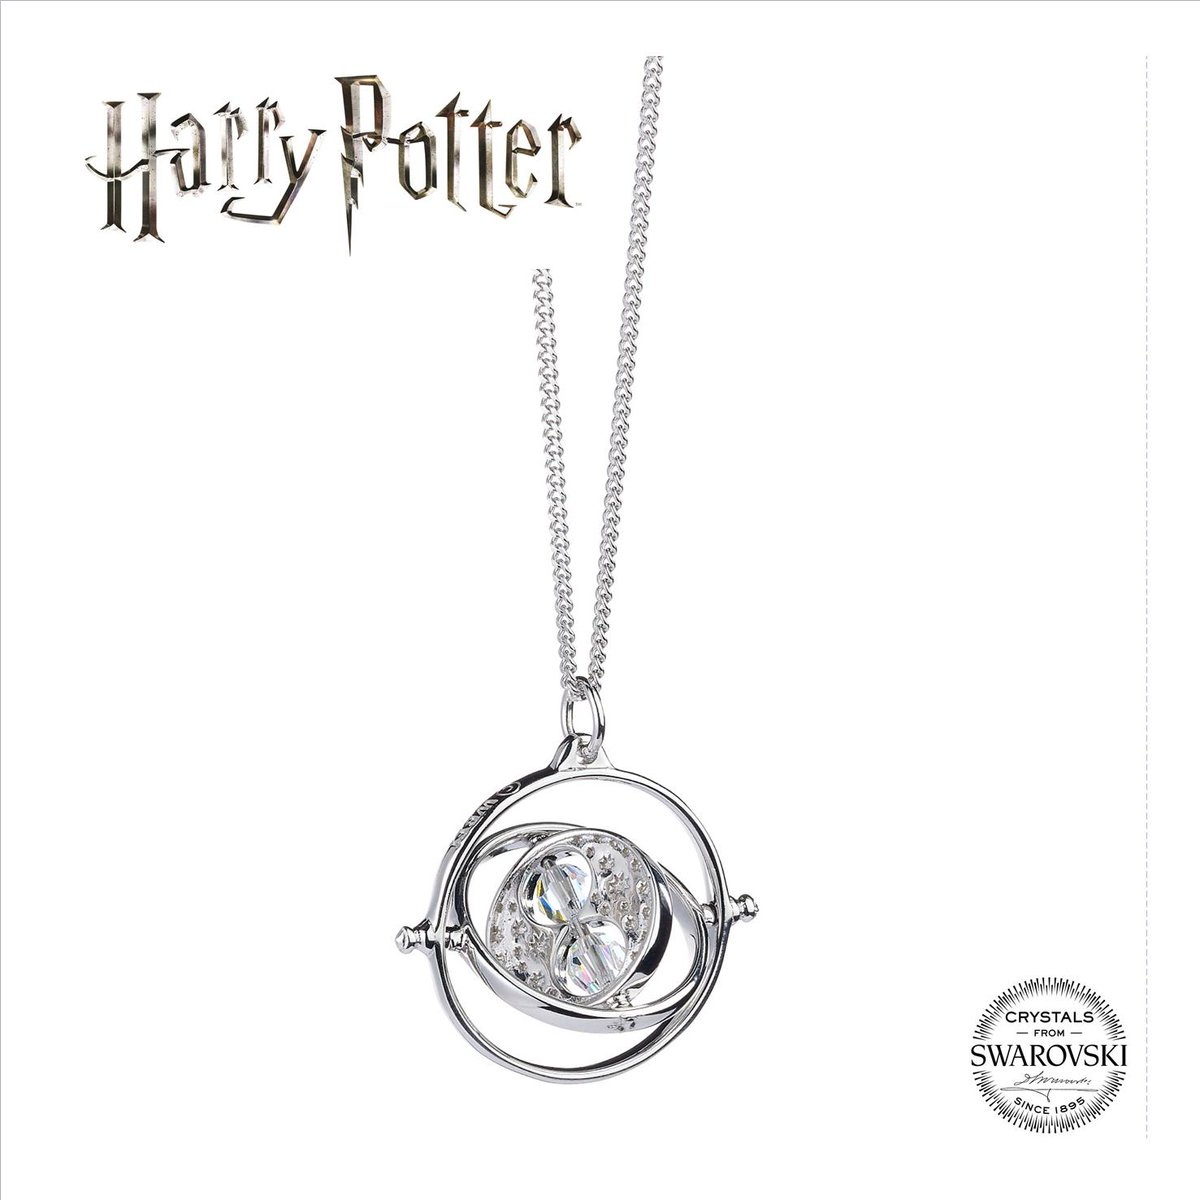 1709d548c ... http://www.thecaratshop.co.uk/new-harry-potter/harry-potter-embellished -with-swarovski-crystal-time-turner-necklace-hpsn021  …pic.twitter.com/sZXhZkoOkD